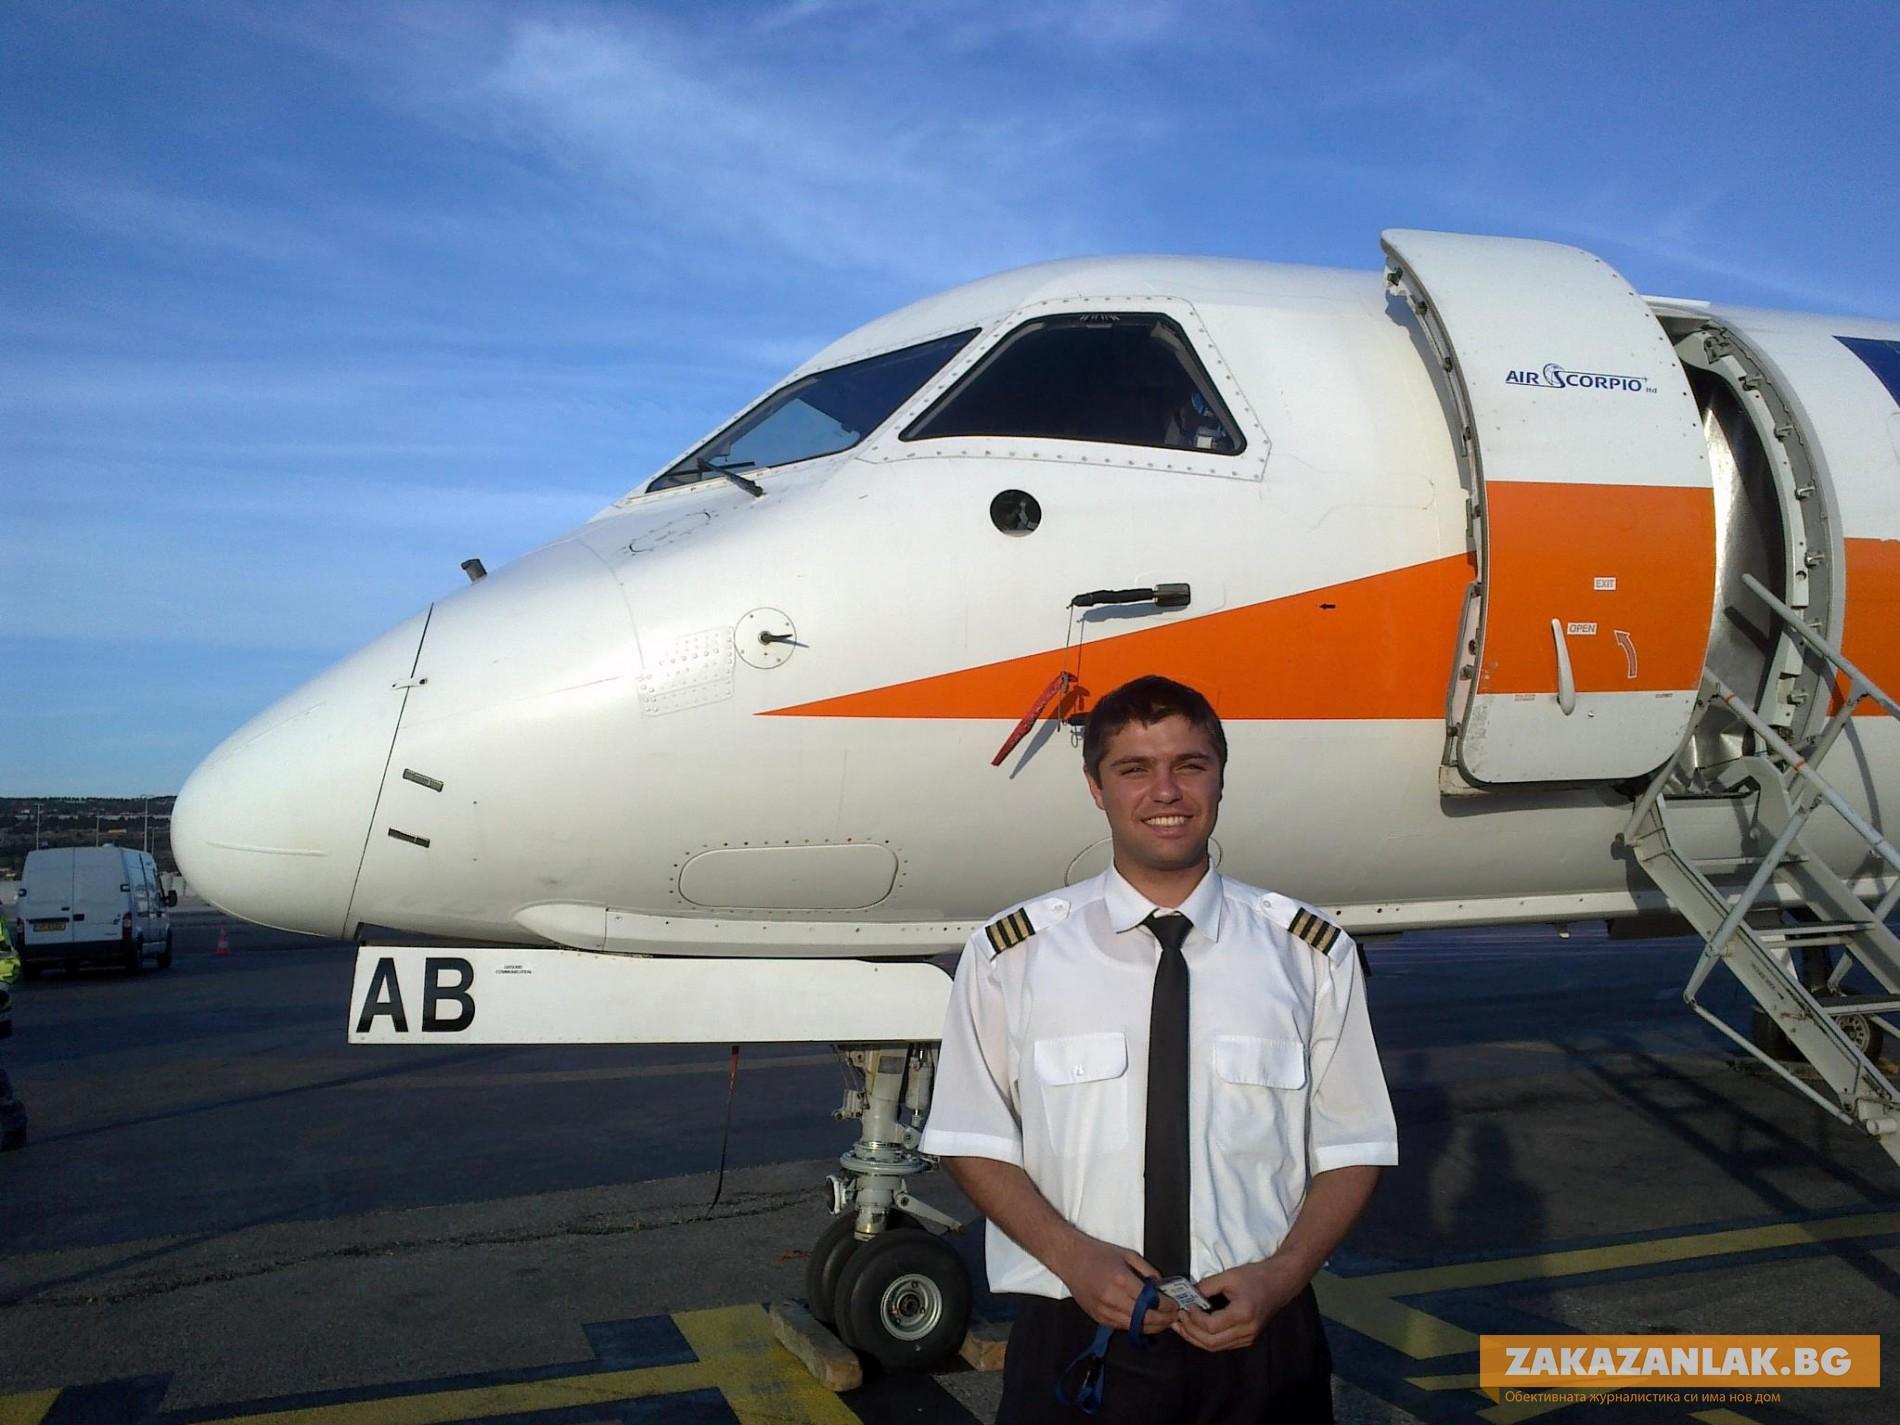 In Memoriam: Данчо полетя завинаги в небесата